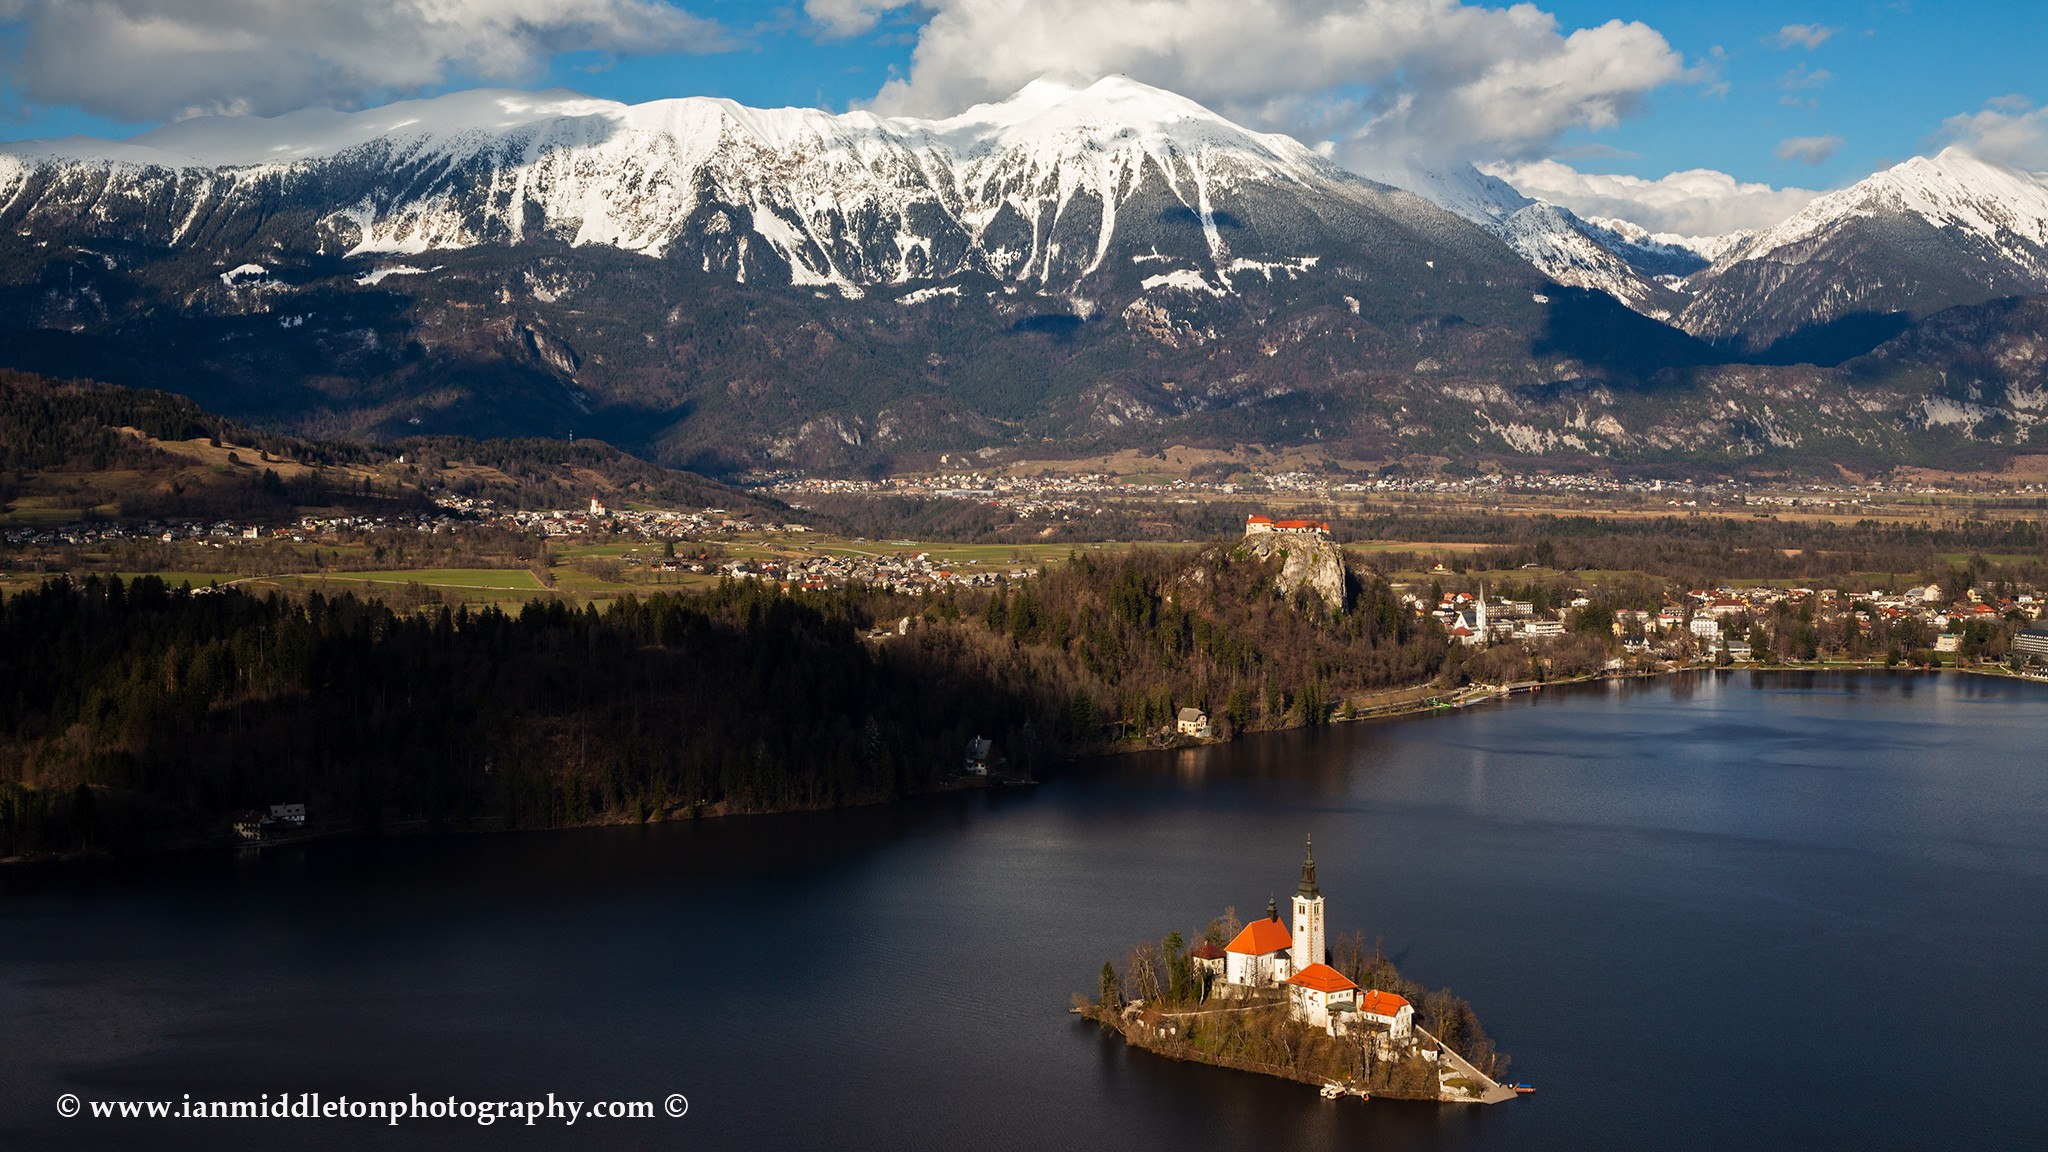 Lake Bled view from Mala Osojnica, Slovenia.